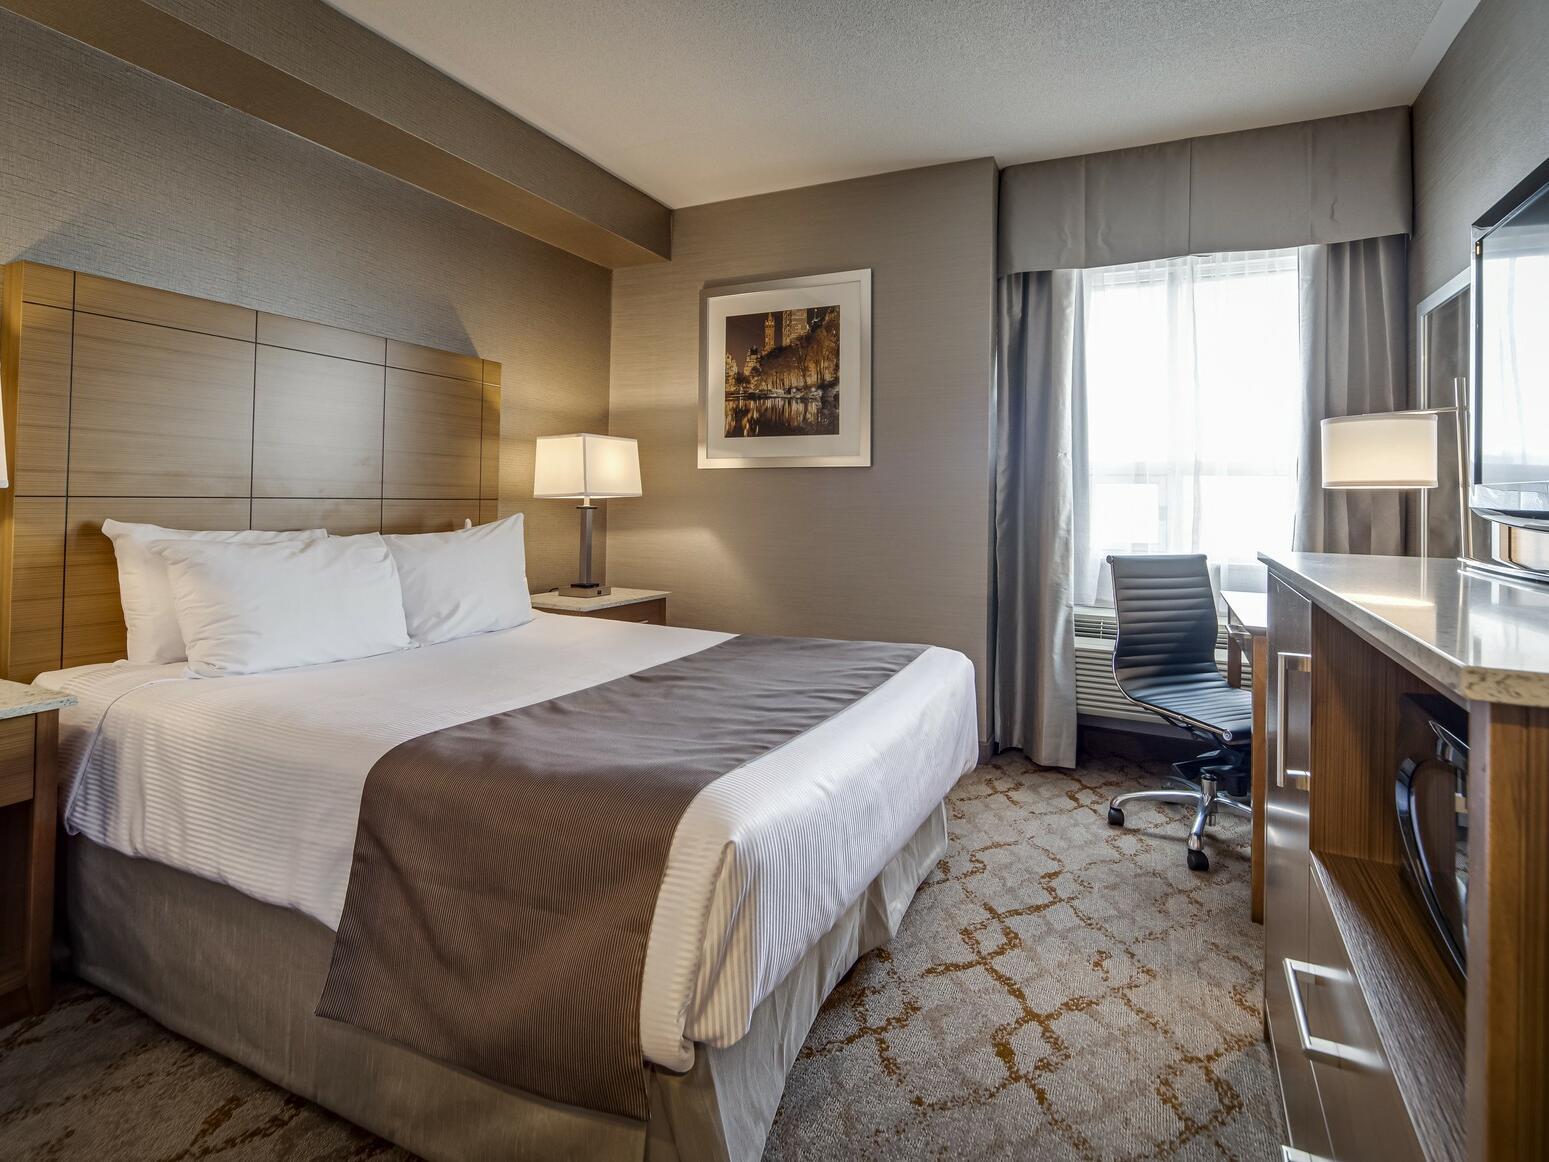 Queen Studio Suite with Sofa Bed at Monte Carlo Inn Vaughan Suites